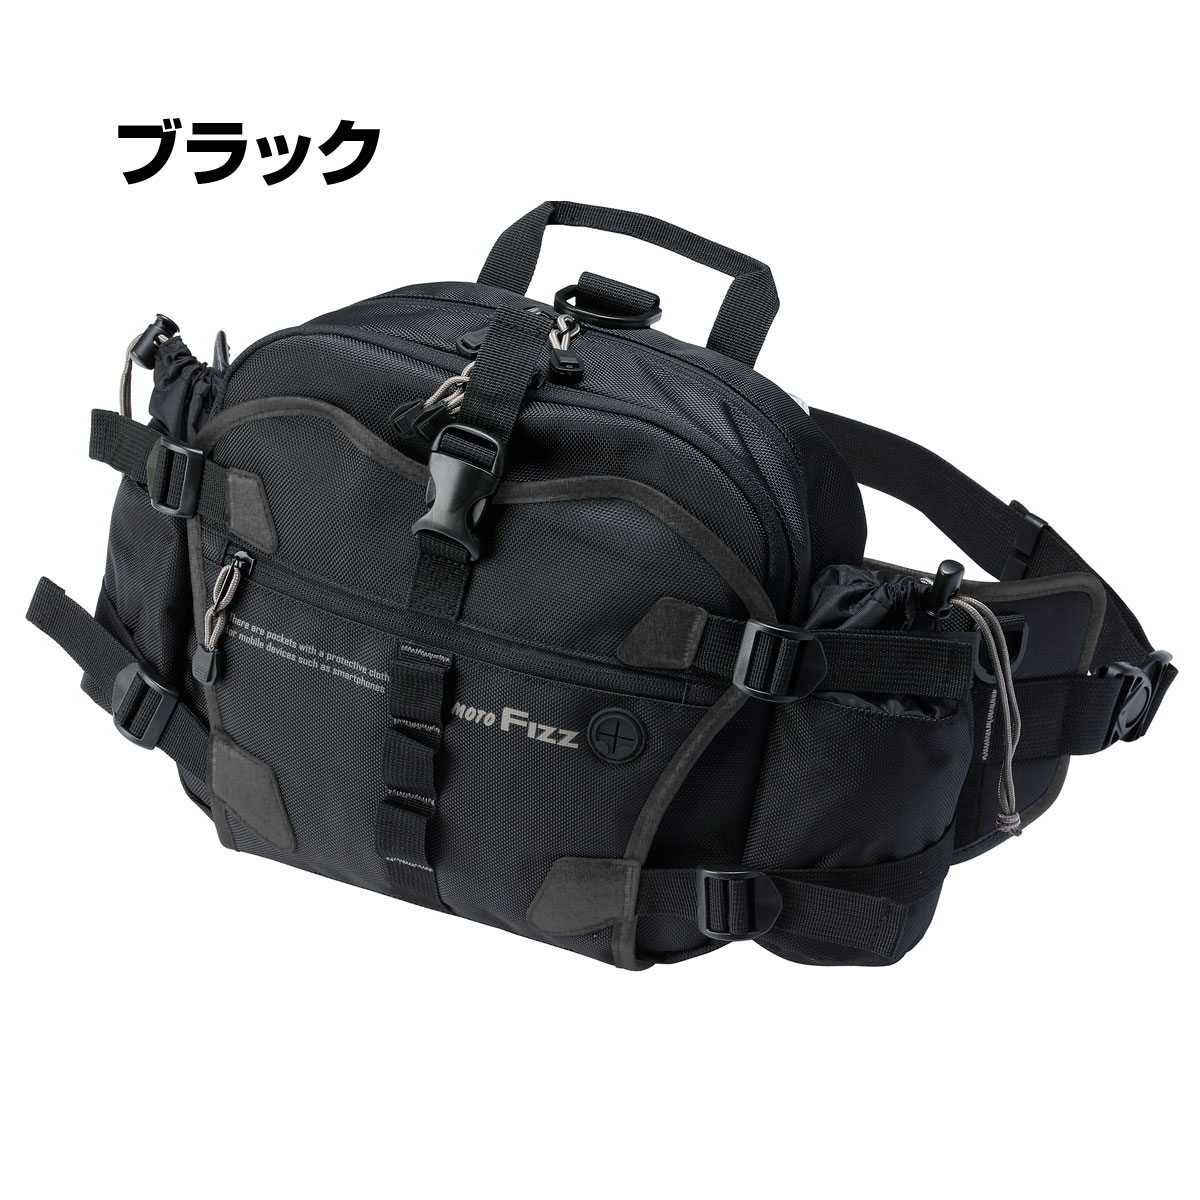 MOTOFizz MFK-204 デジバッグプラス【ブラック】【モトフィズ ヒップバッグ MFK204】